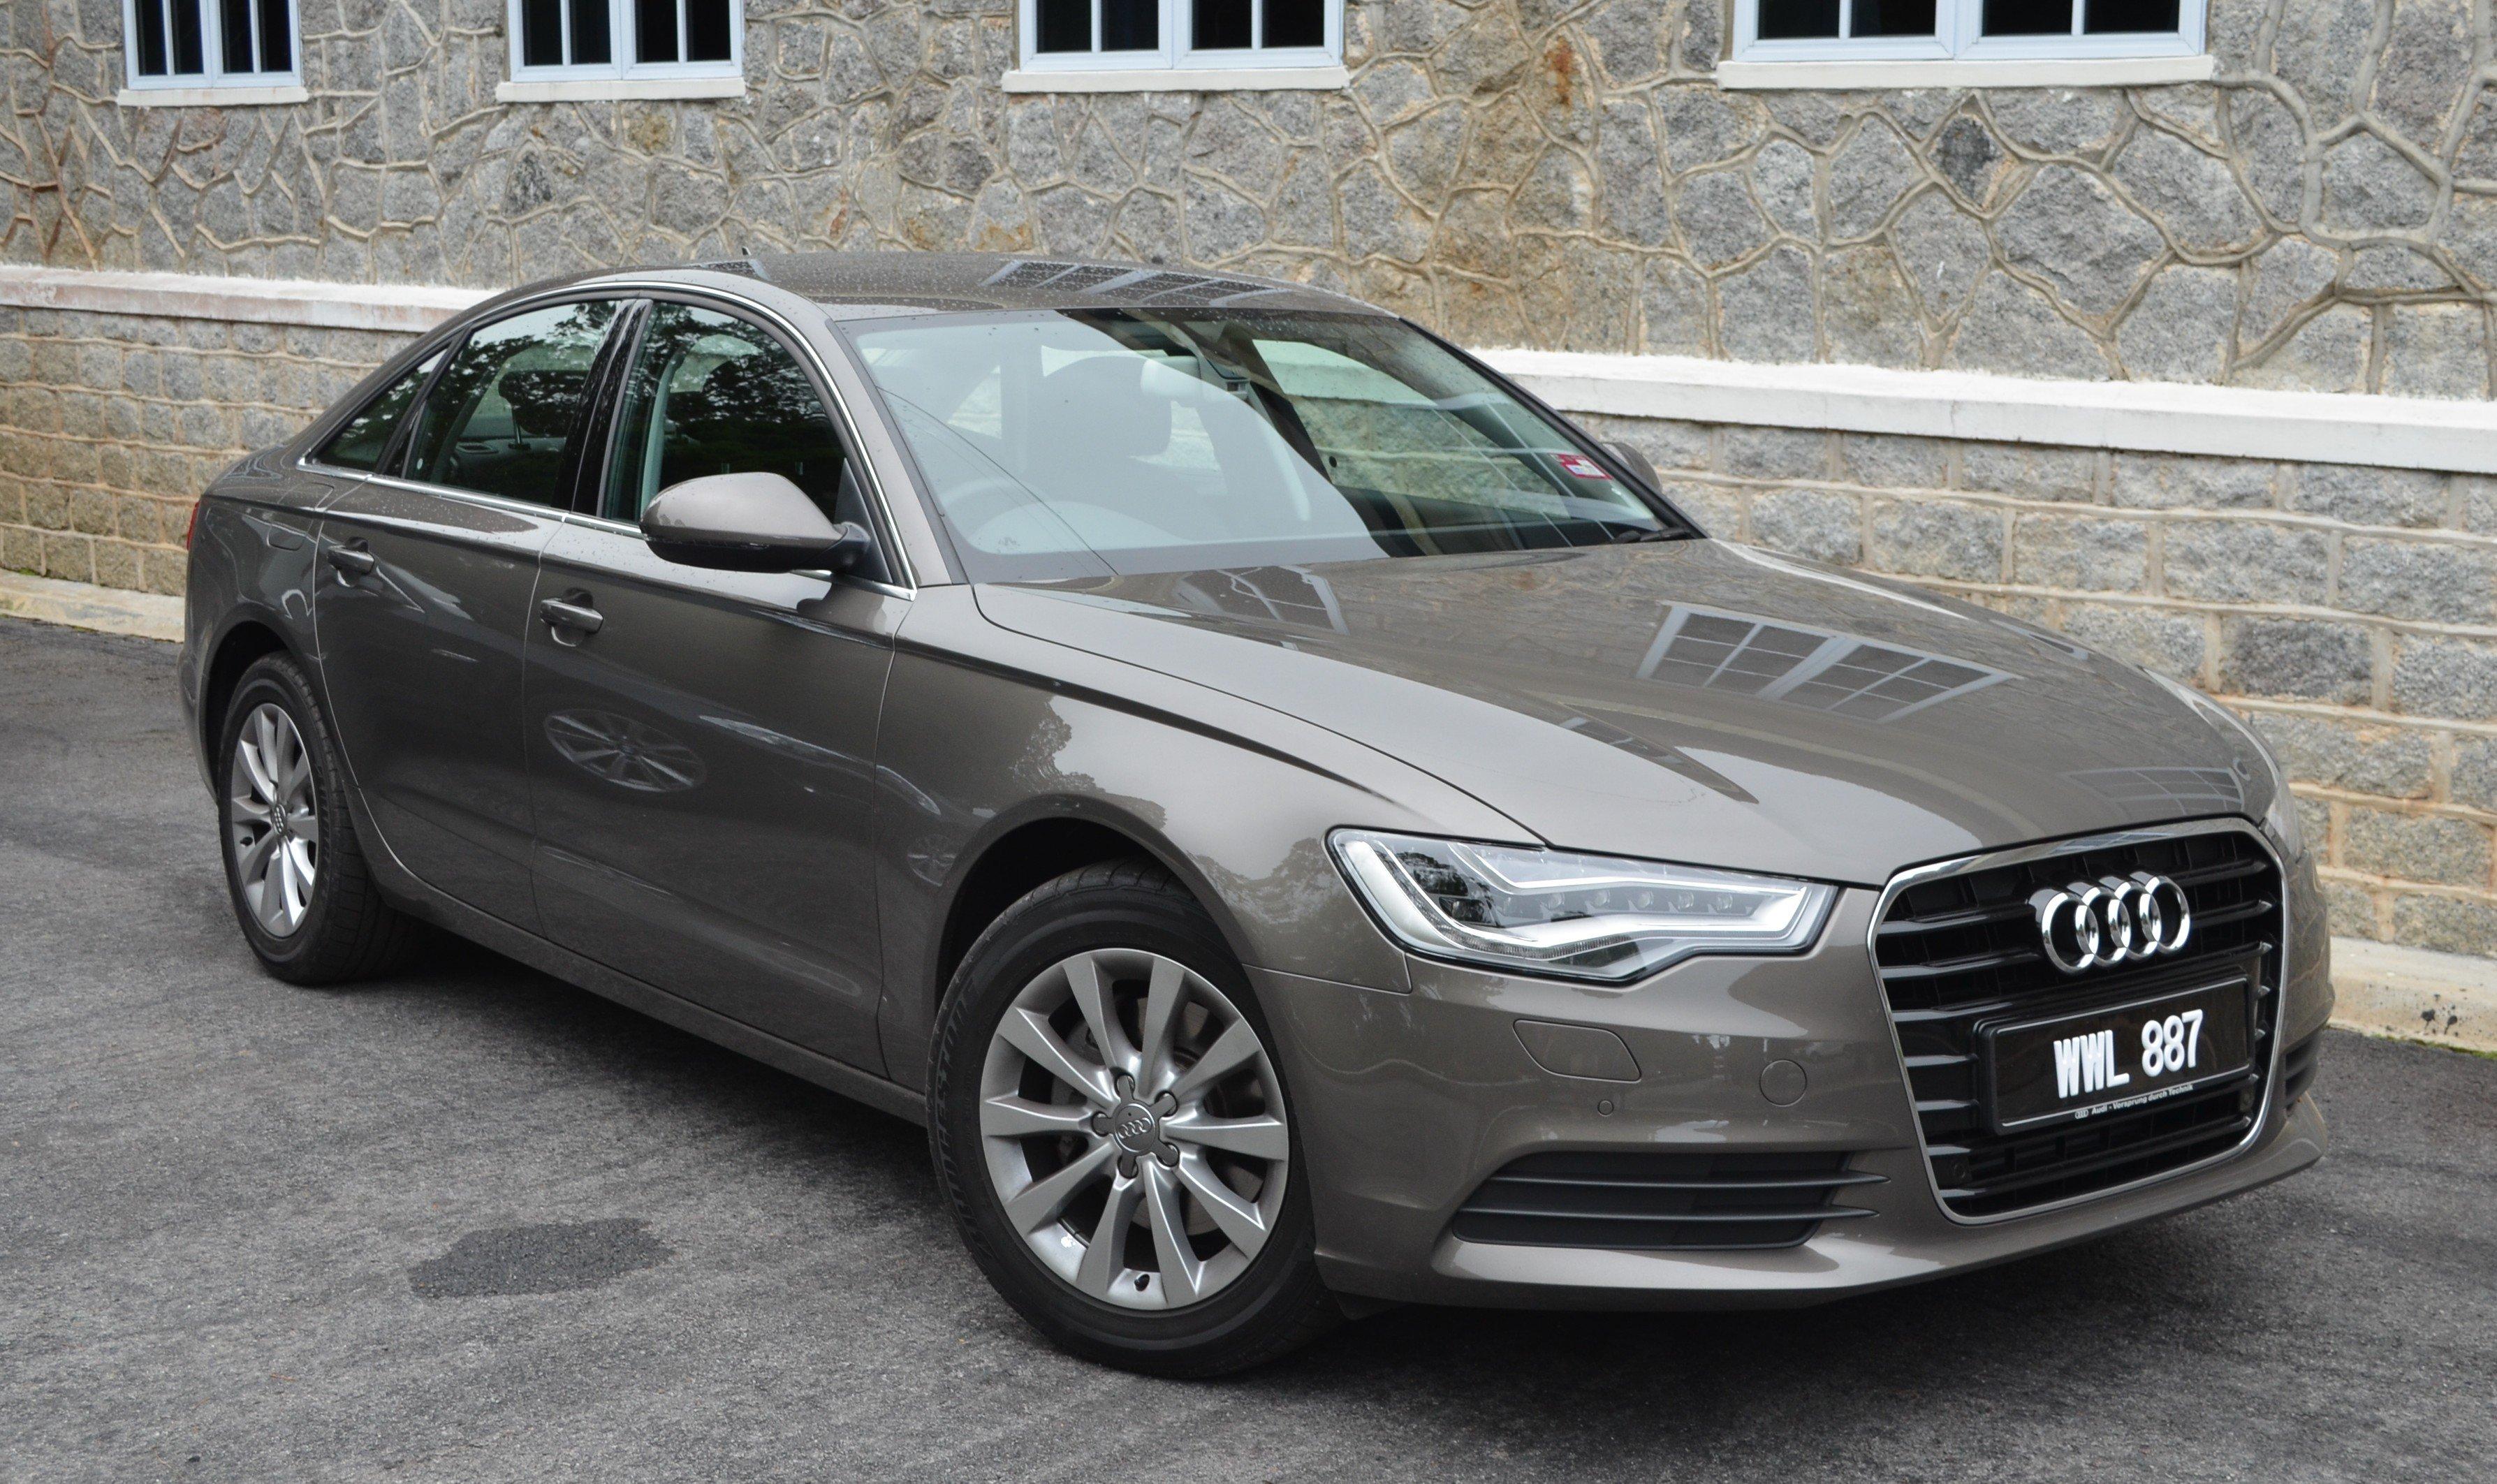 Lexus Gs Vs Infiniti Q50 Vs Audi A6 | Autos Post